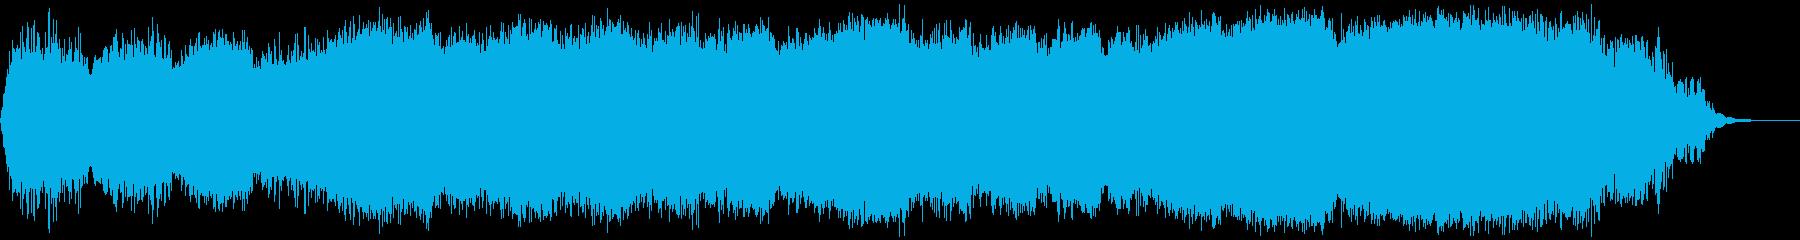 Deep Spaceの再生済みの波形